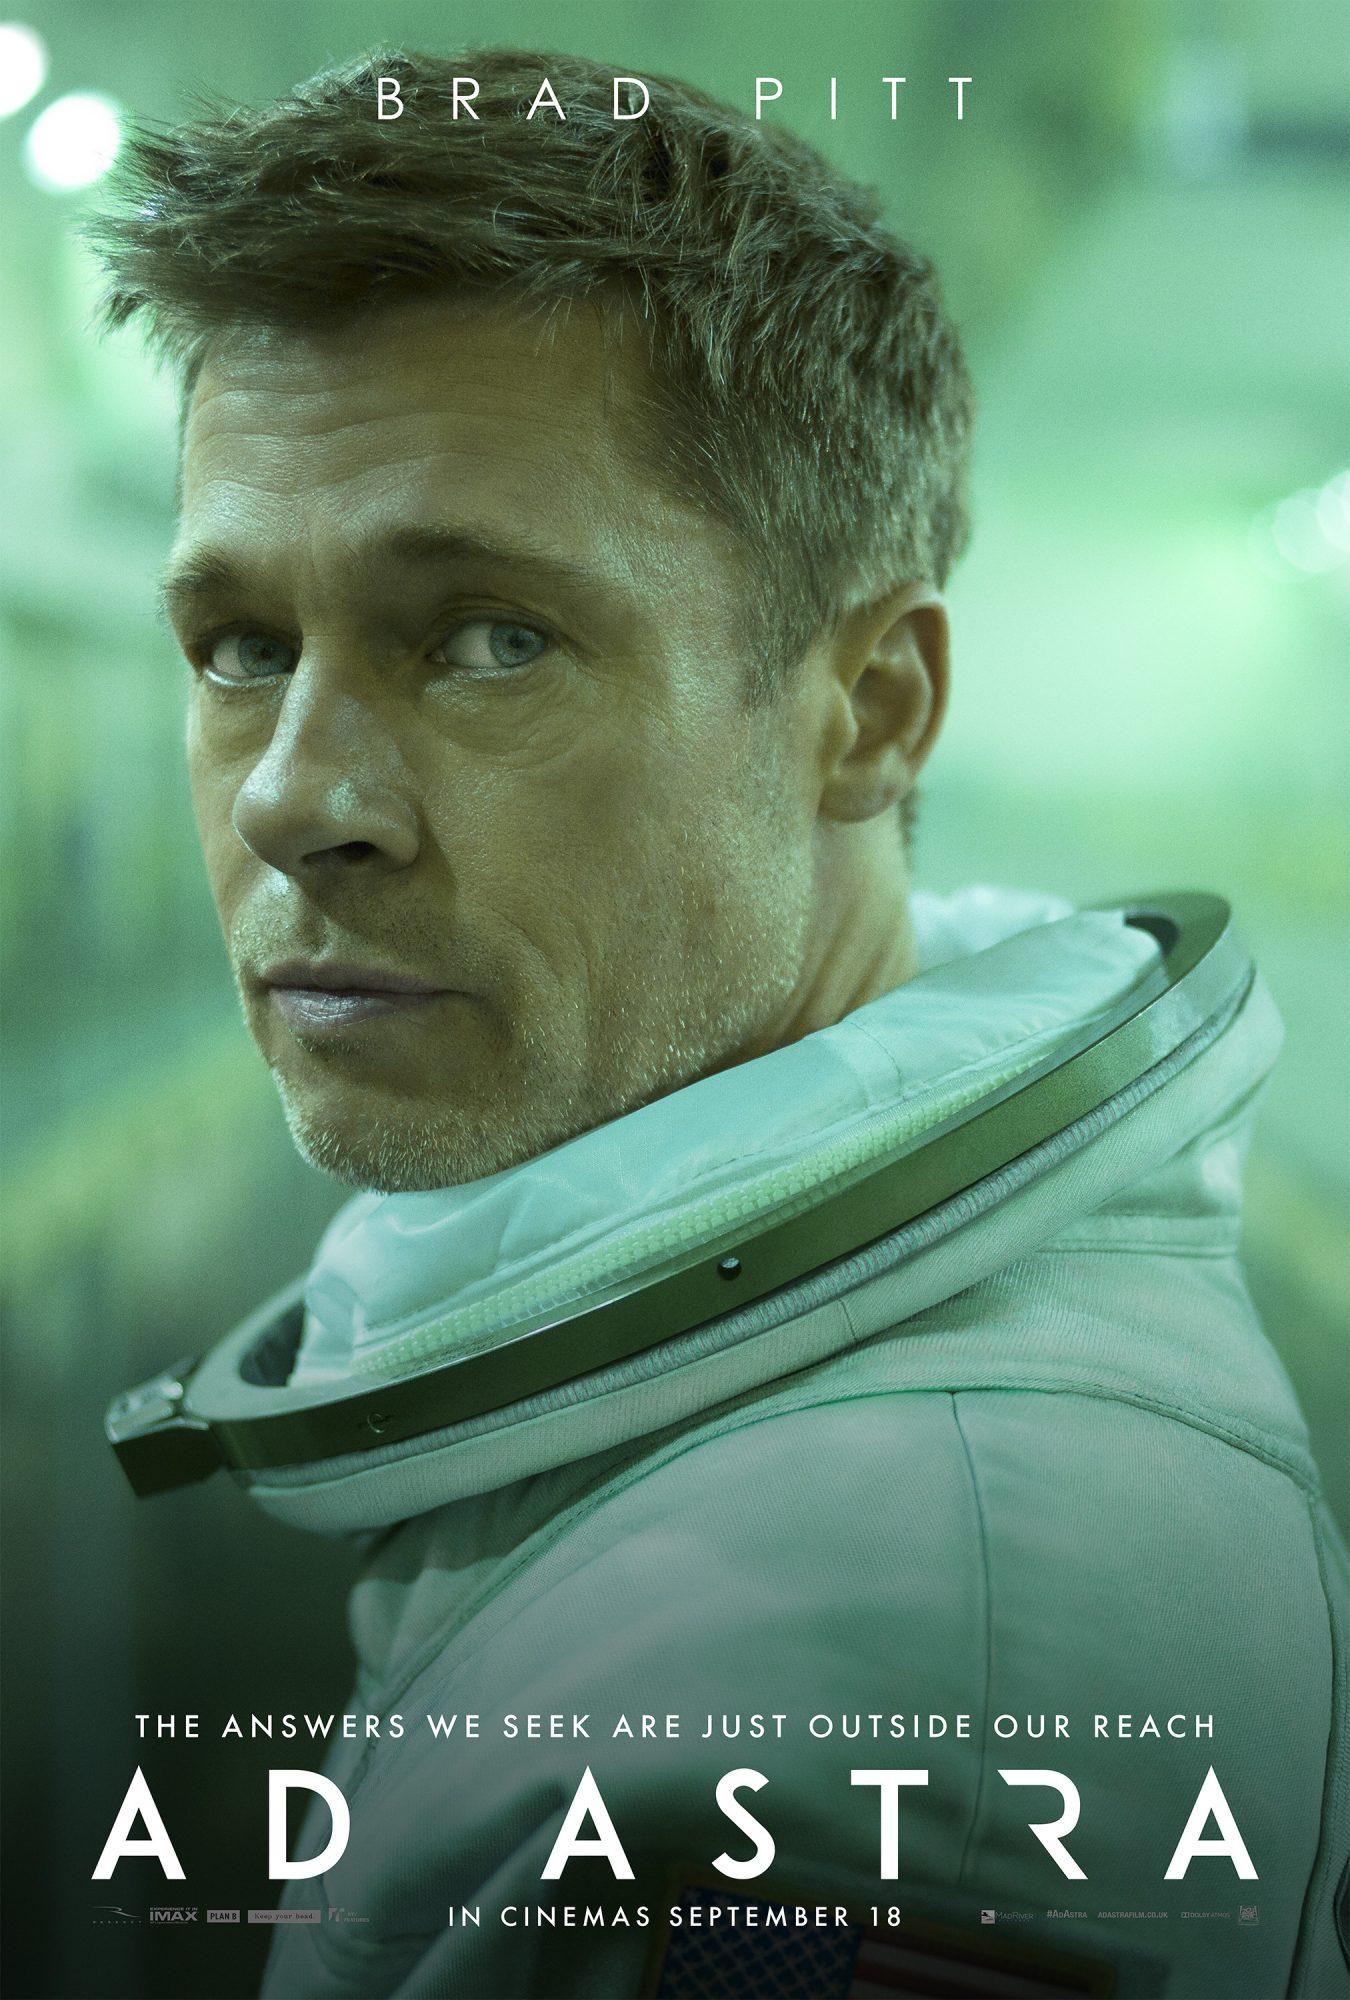 Ad Astra Review - starring Brad Pitt